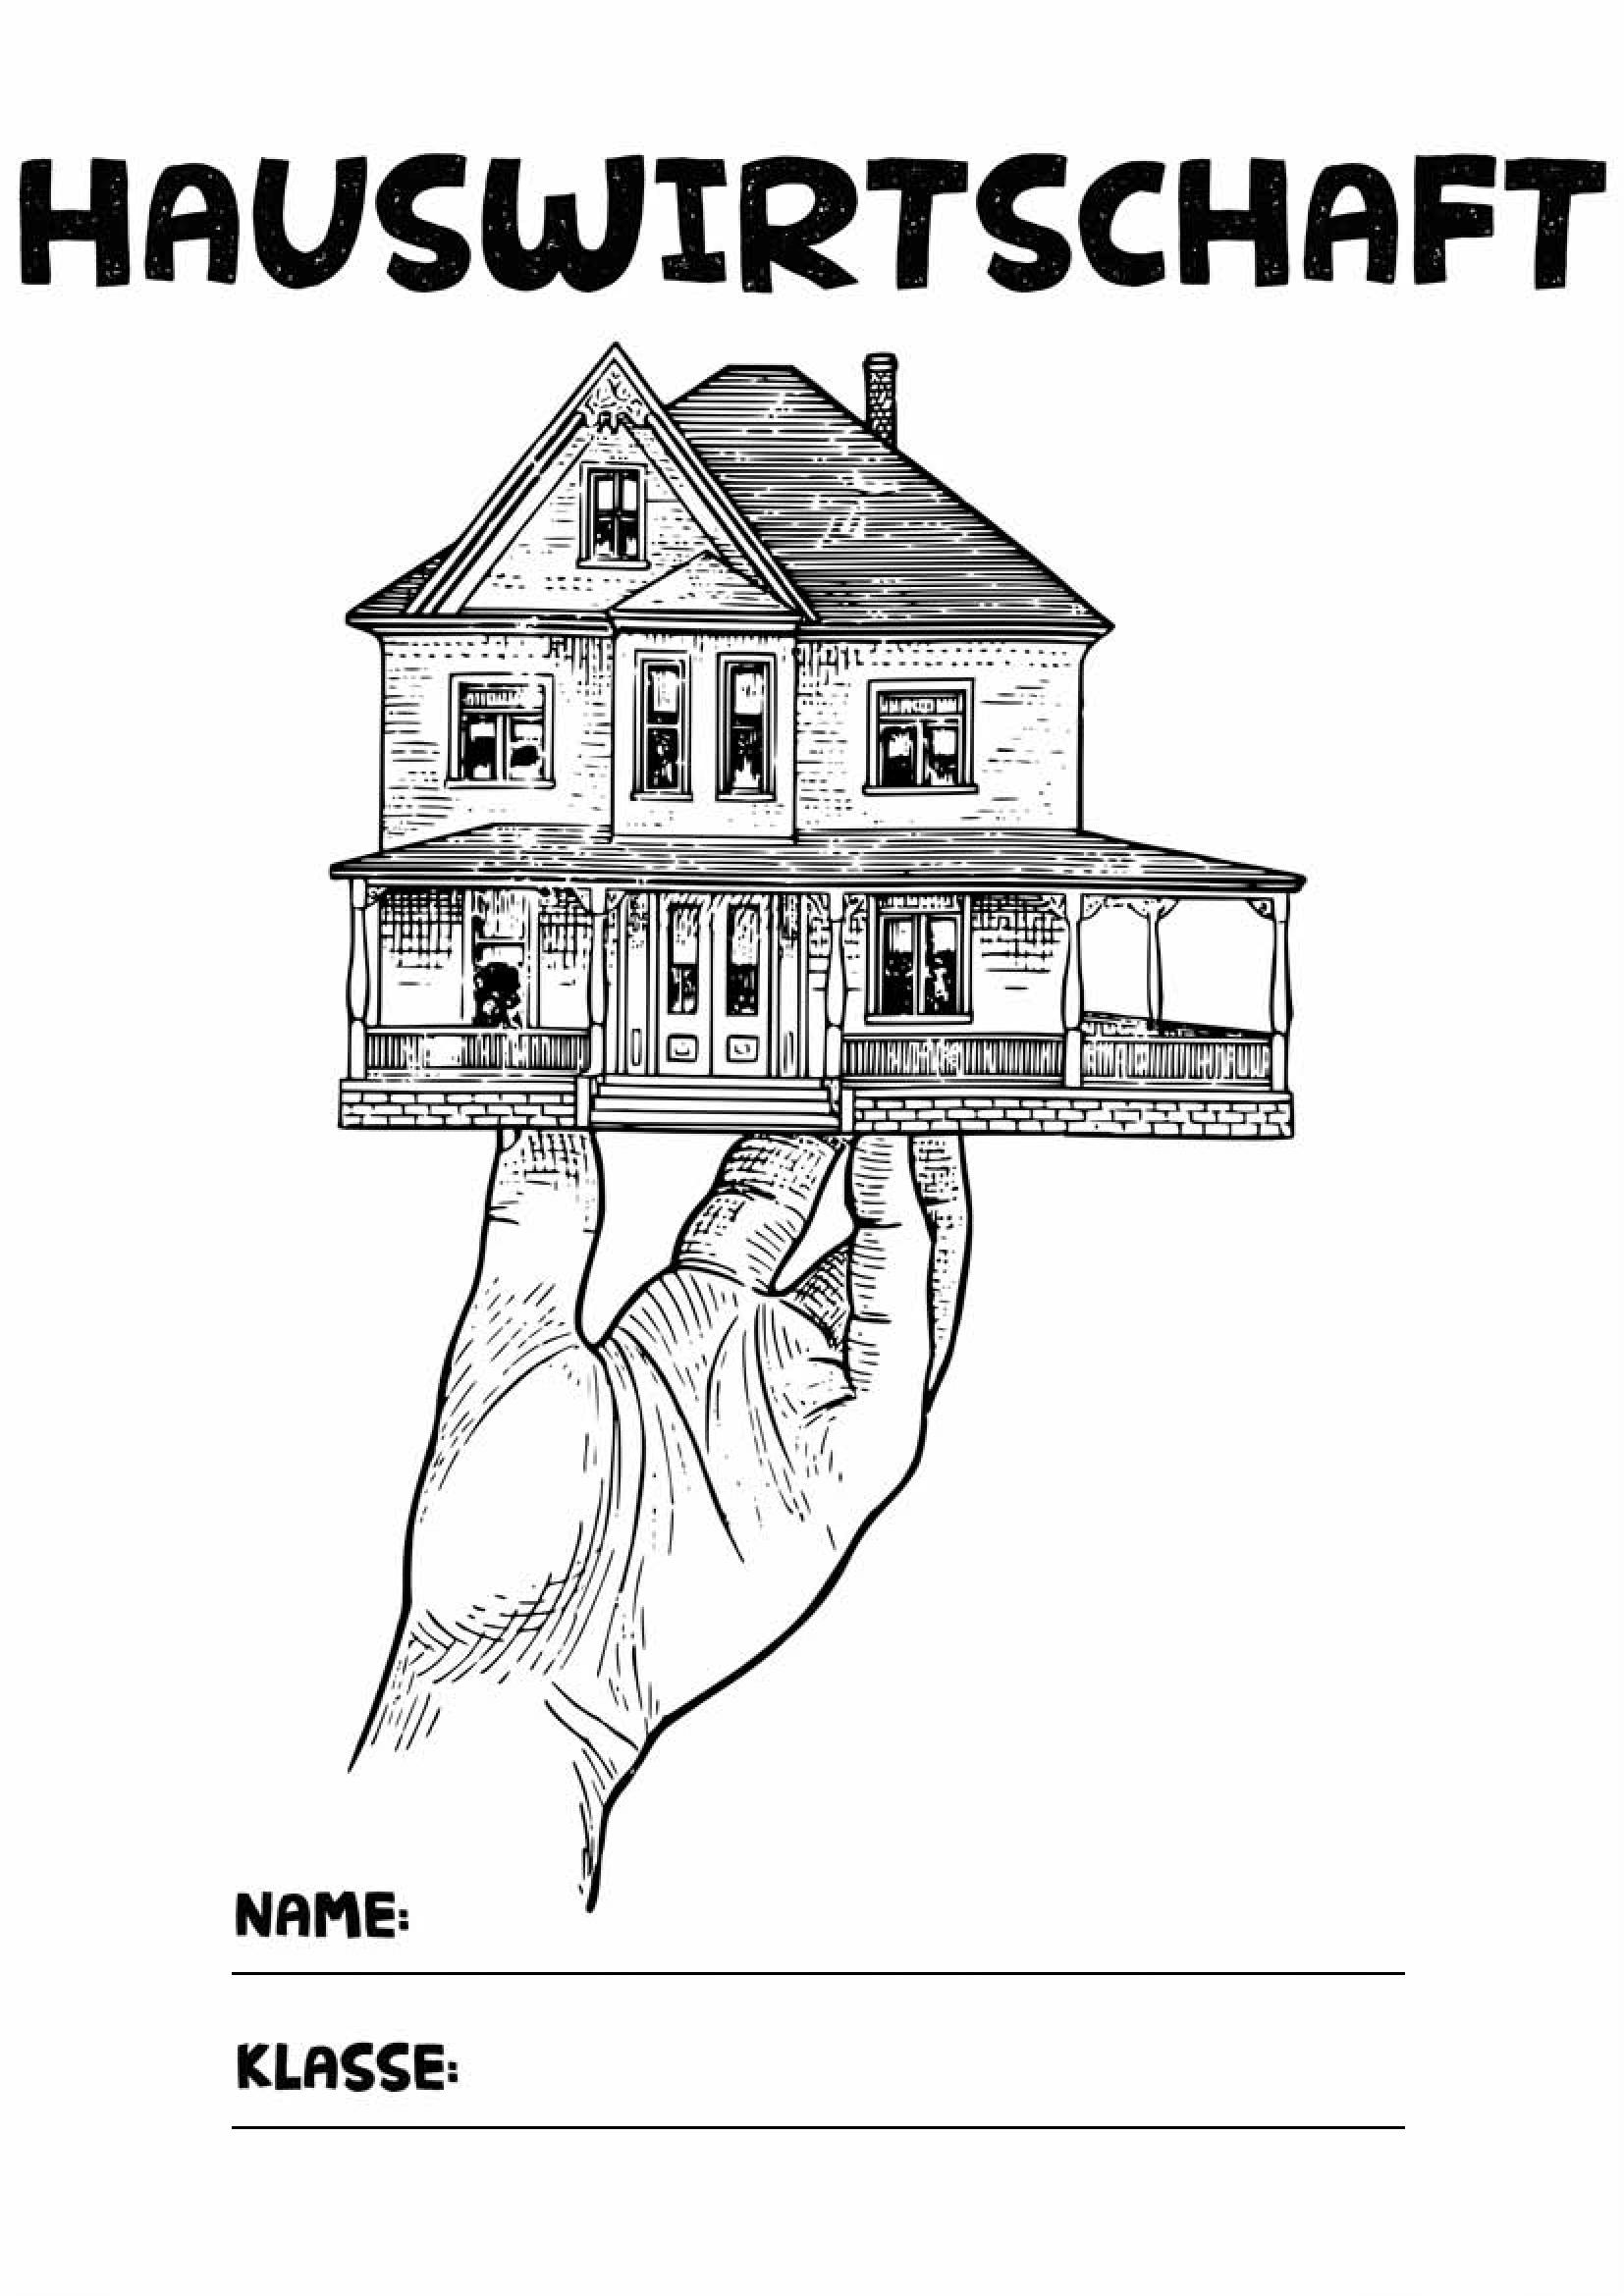 Deckblatt Hauswirtschaft 1 Hauswirtschaft Deckblatt Deckblatt Schule